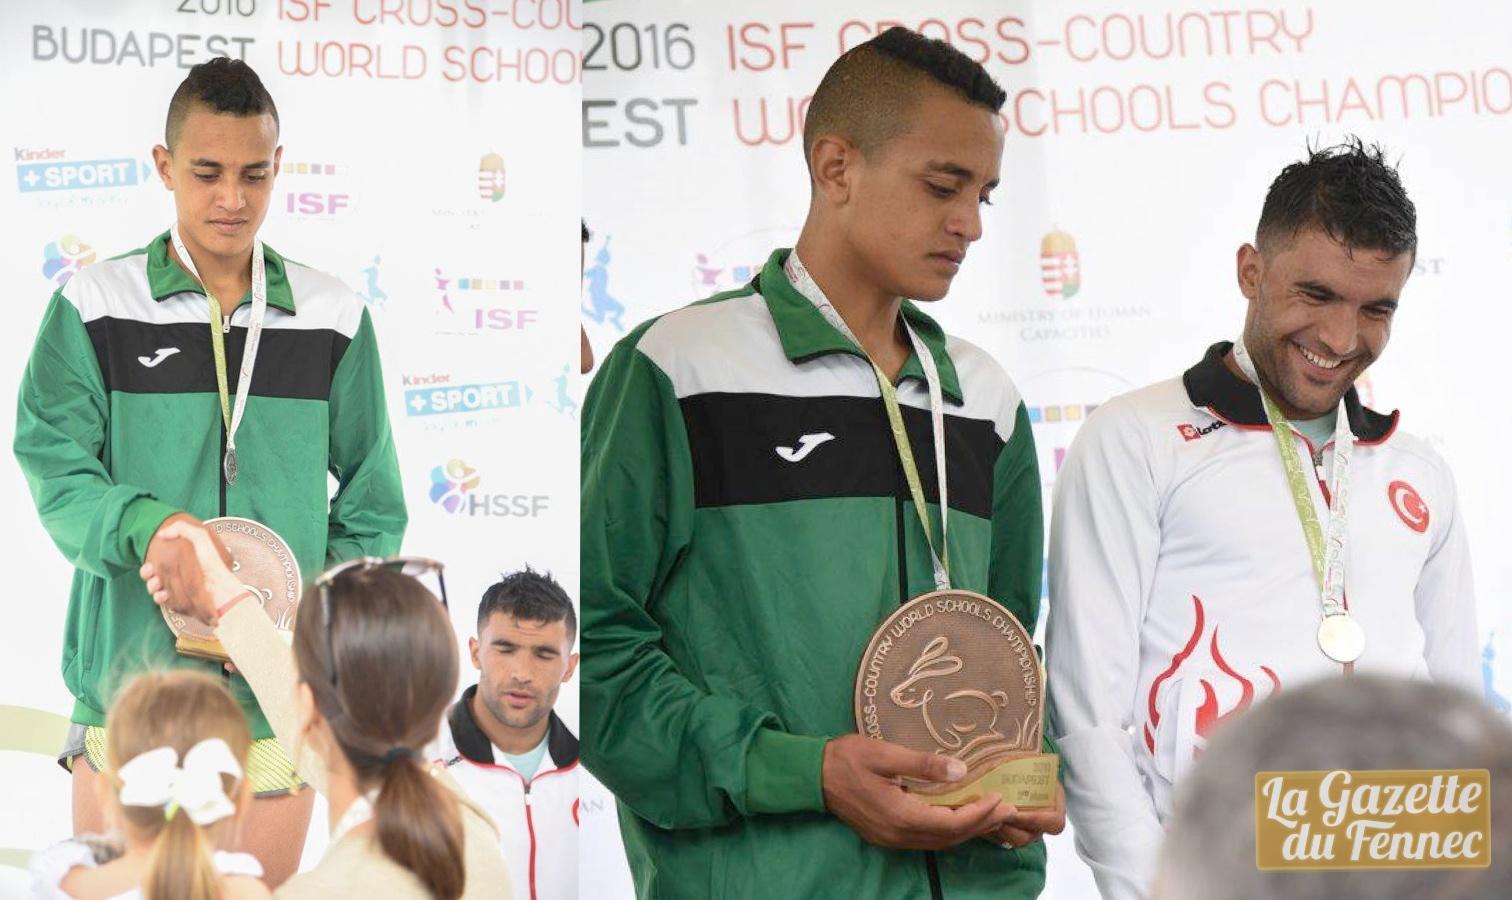 said derbal athlétisme podium cross budapest 2016